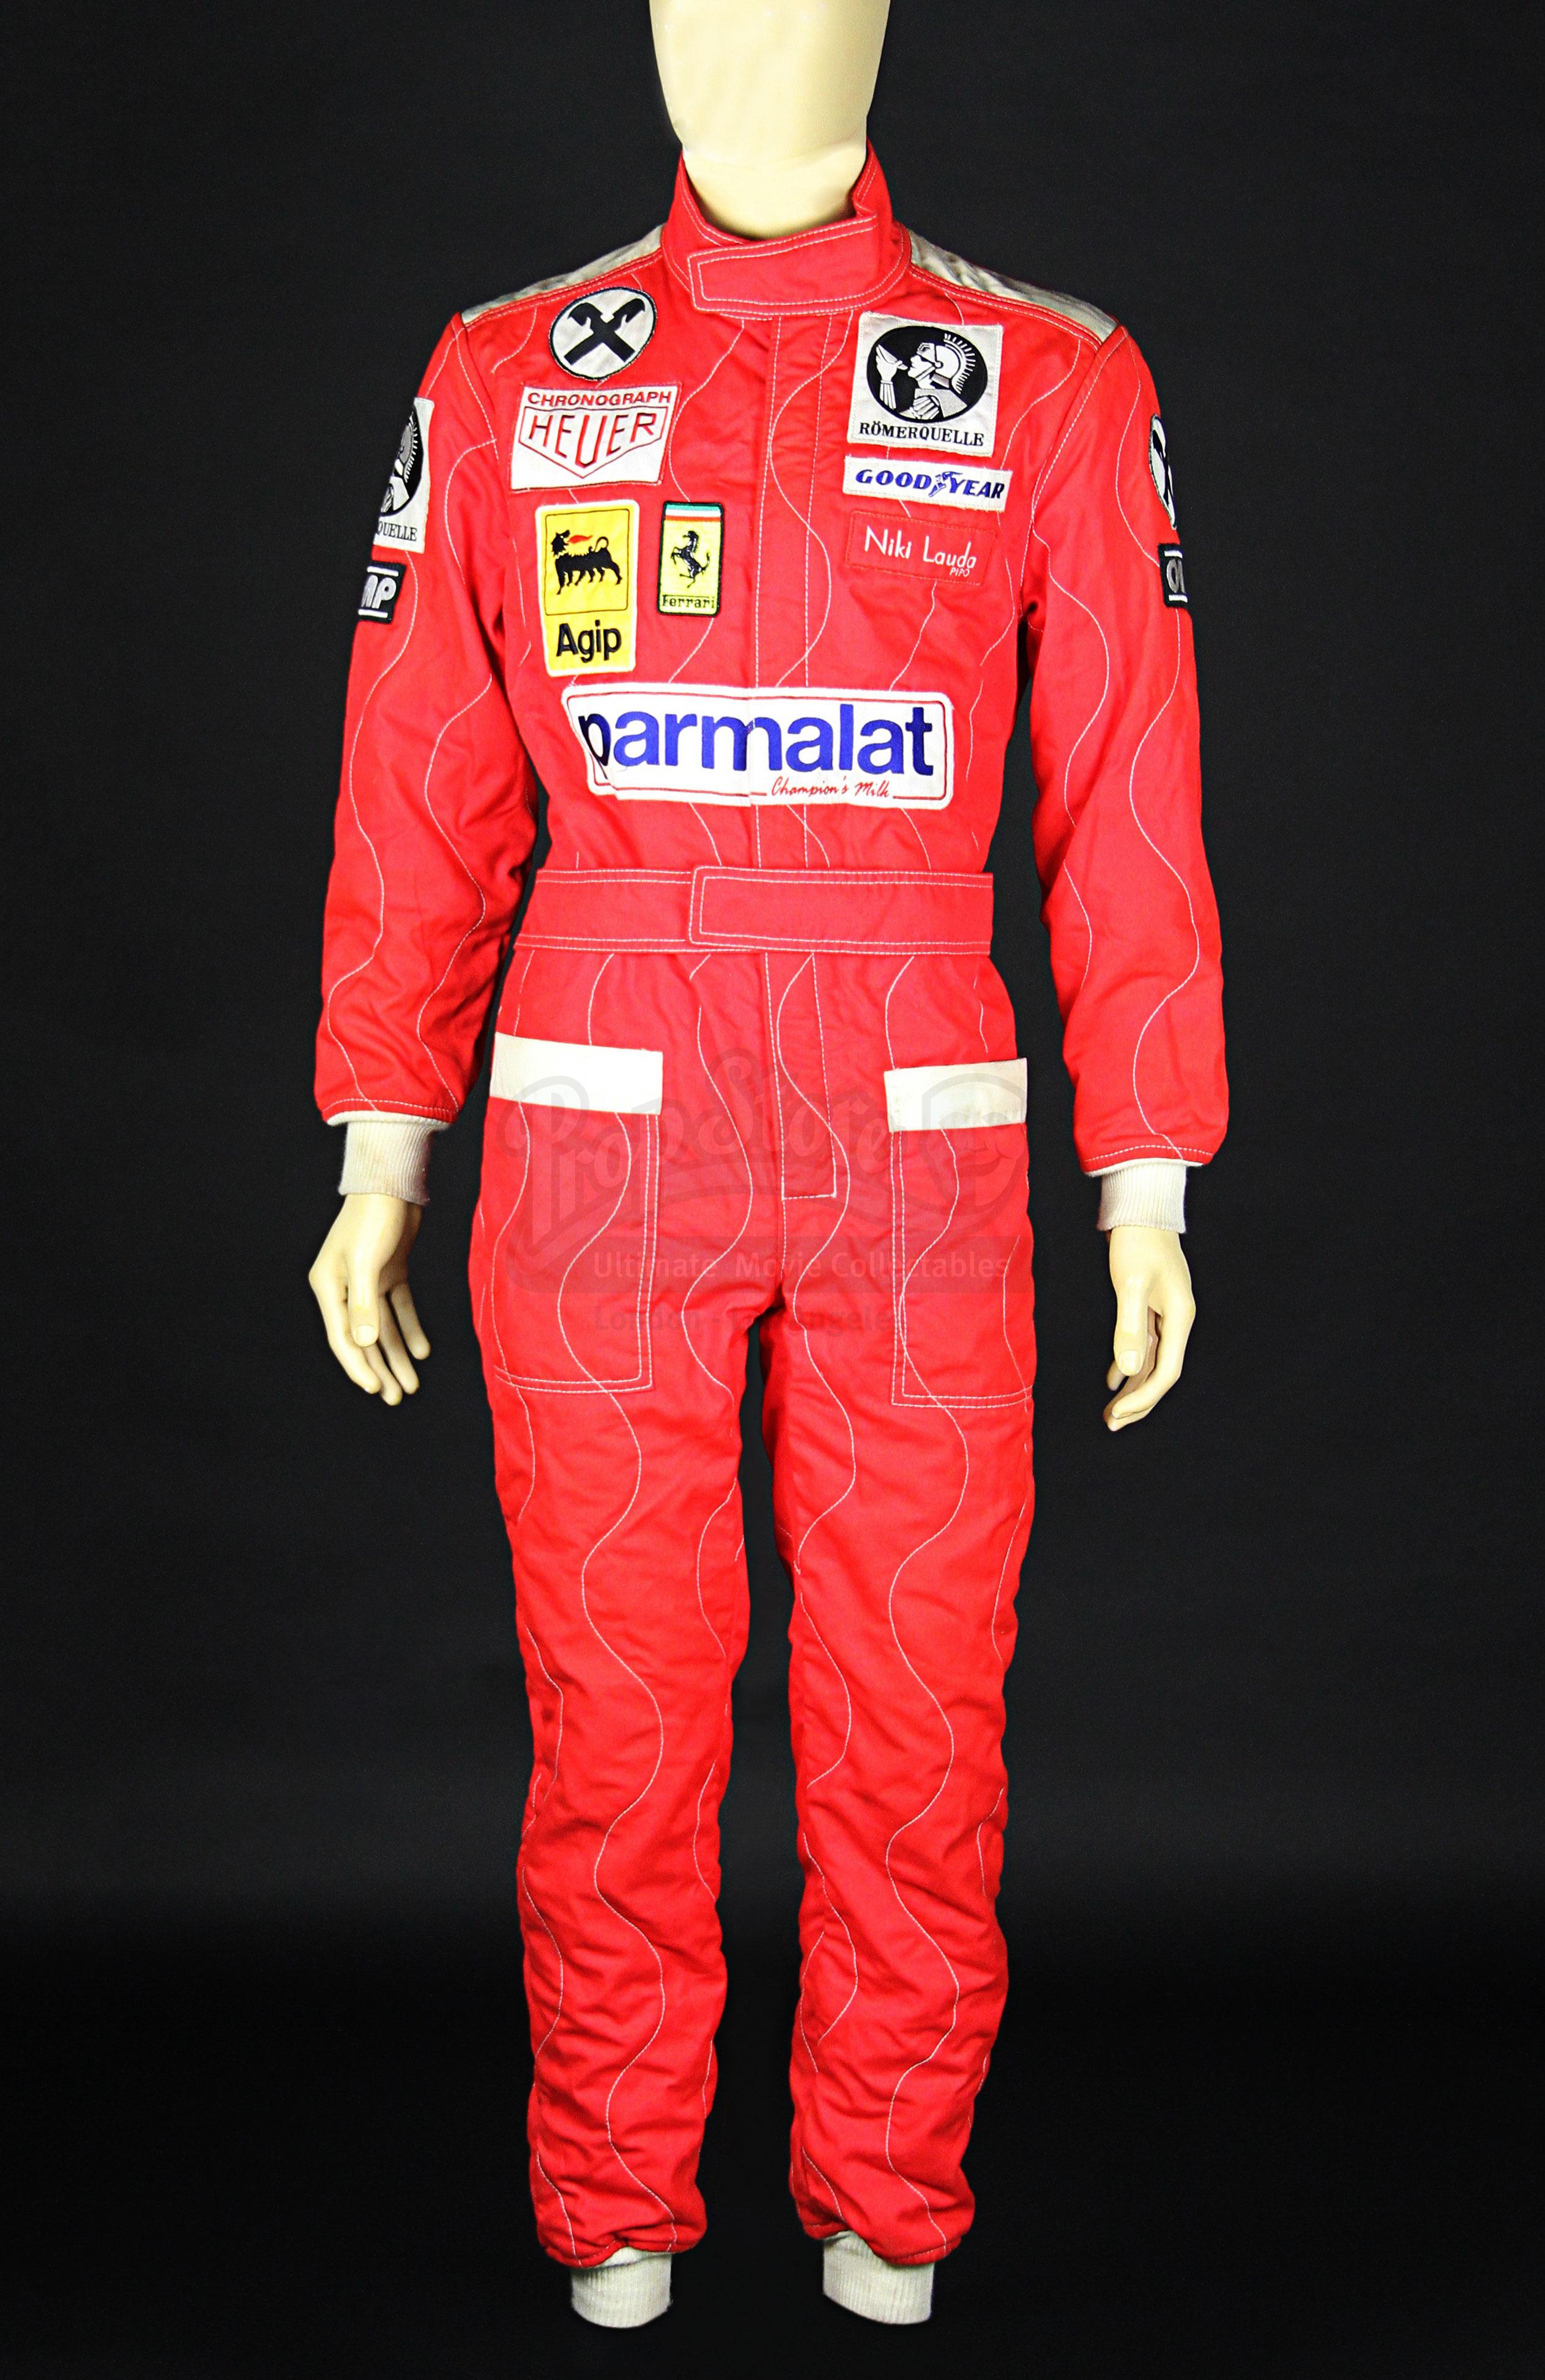 Rush Niki Lauda S Daniel Brühl Ferrari Fire Racing Suit Rc018 Current Price 3600